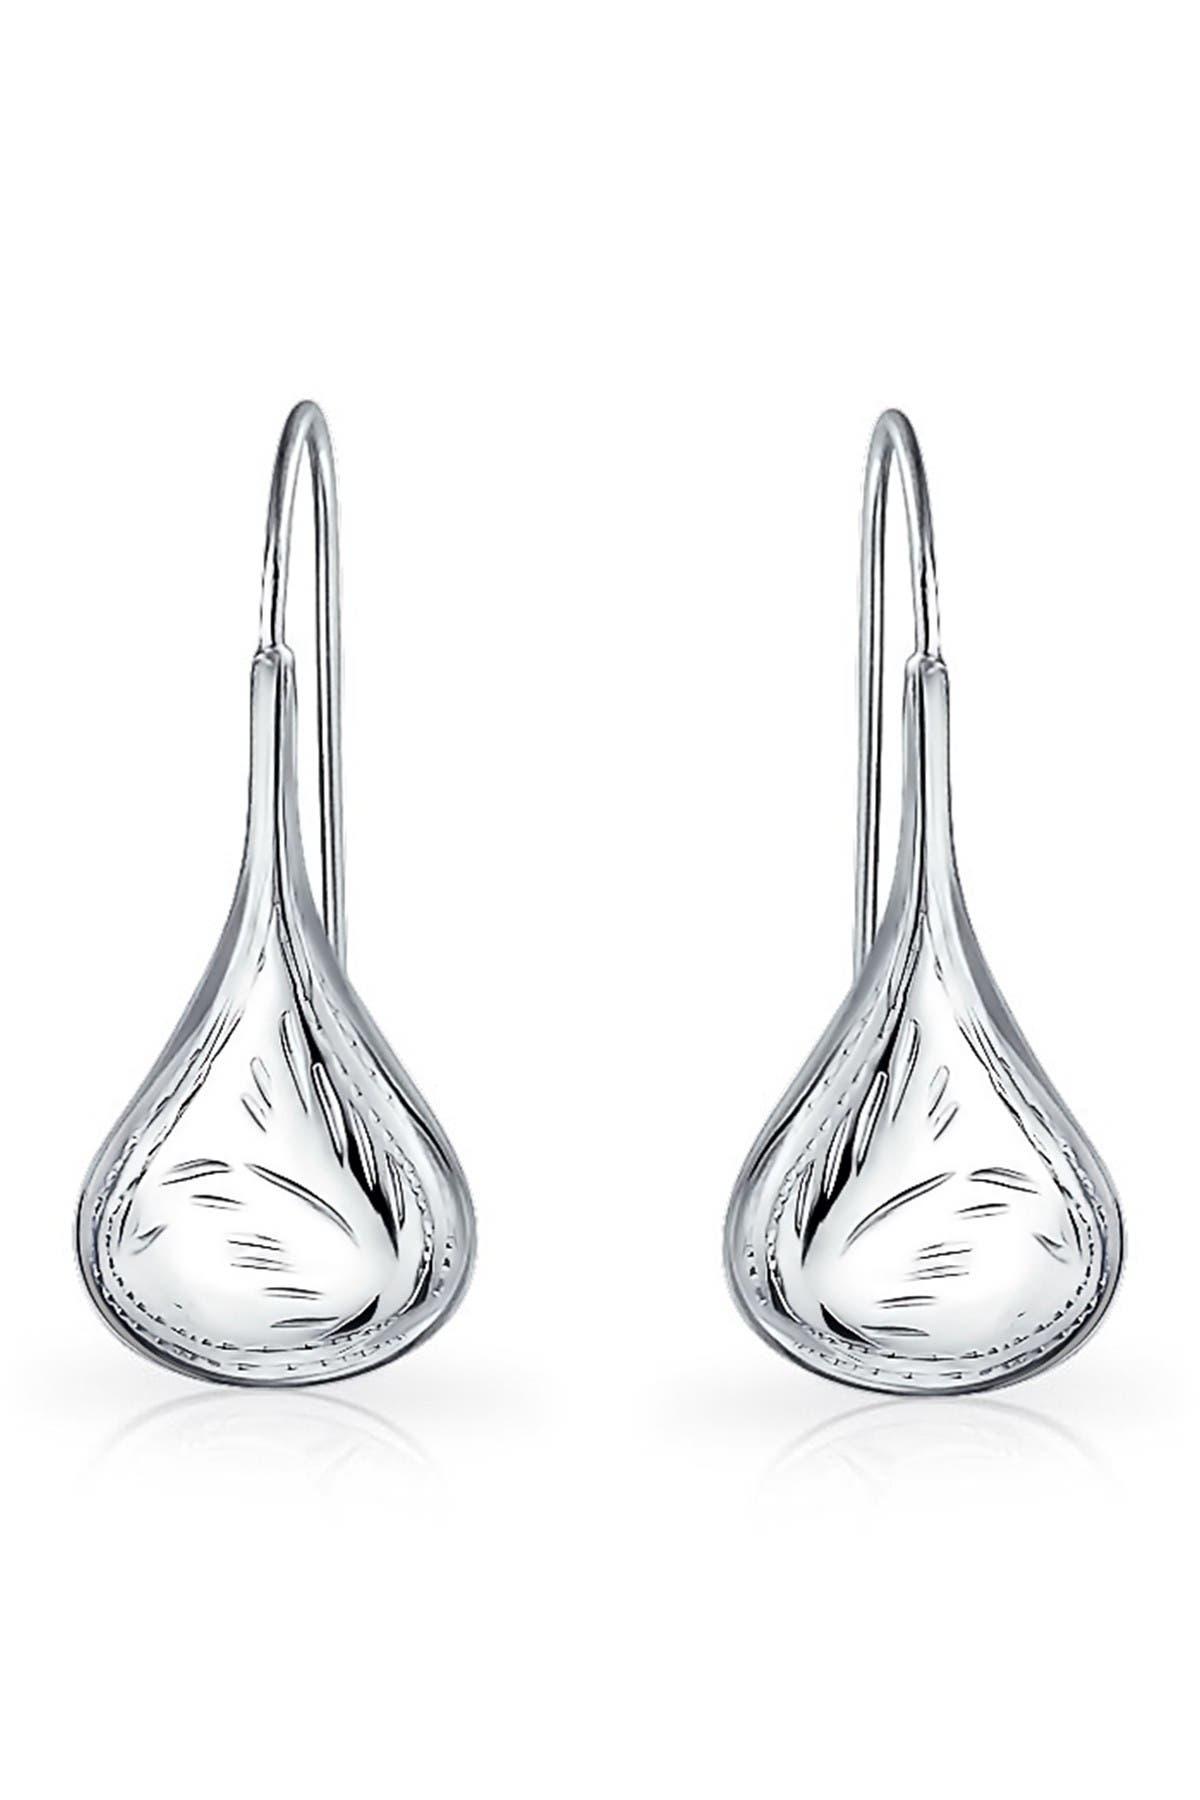 Image of Bling Jewelry Sterling Silver Etched Teardrop Earrings